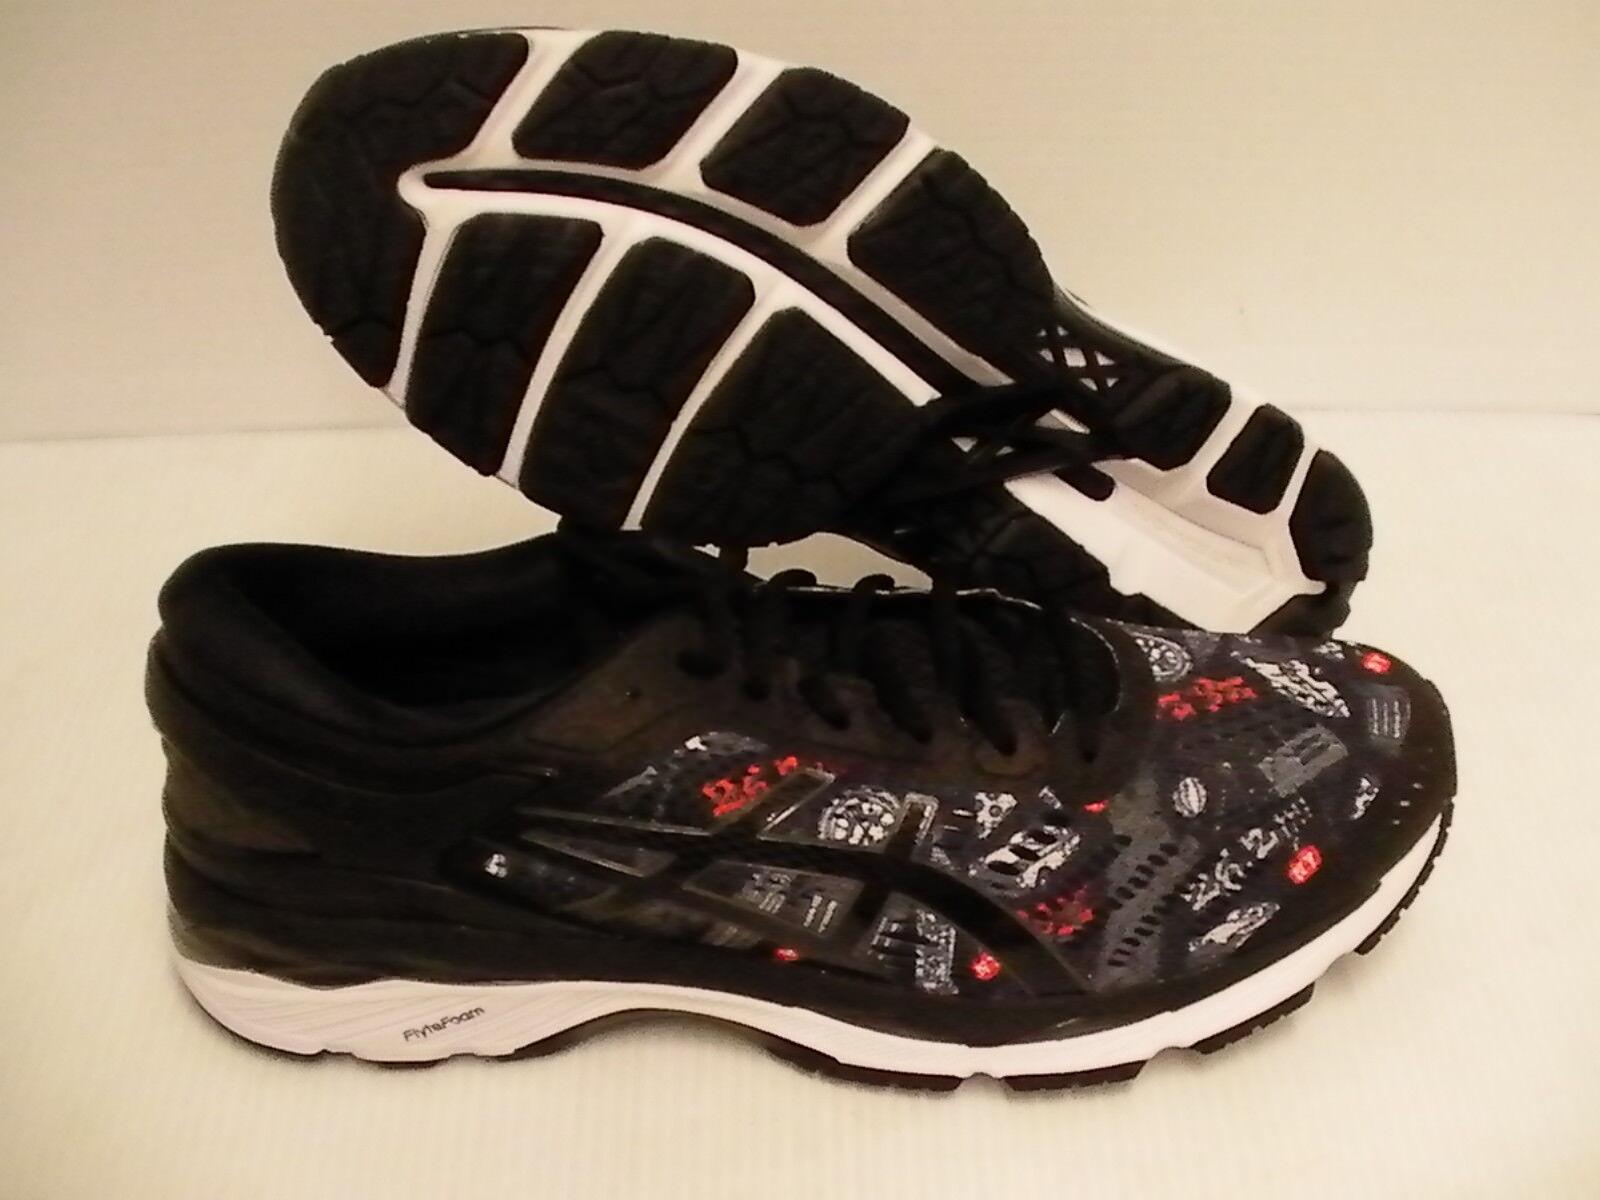 Asics men's gel kayano 24 nyc twenty six two running shoes size 10.5 us